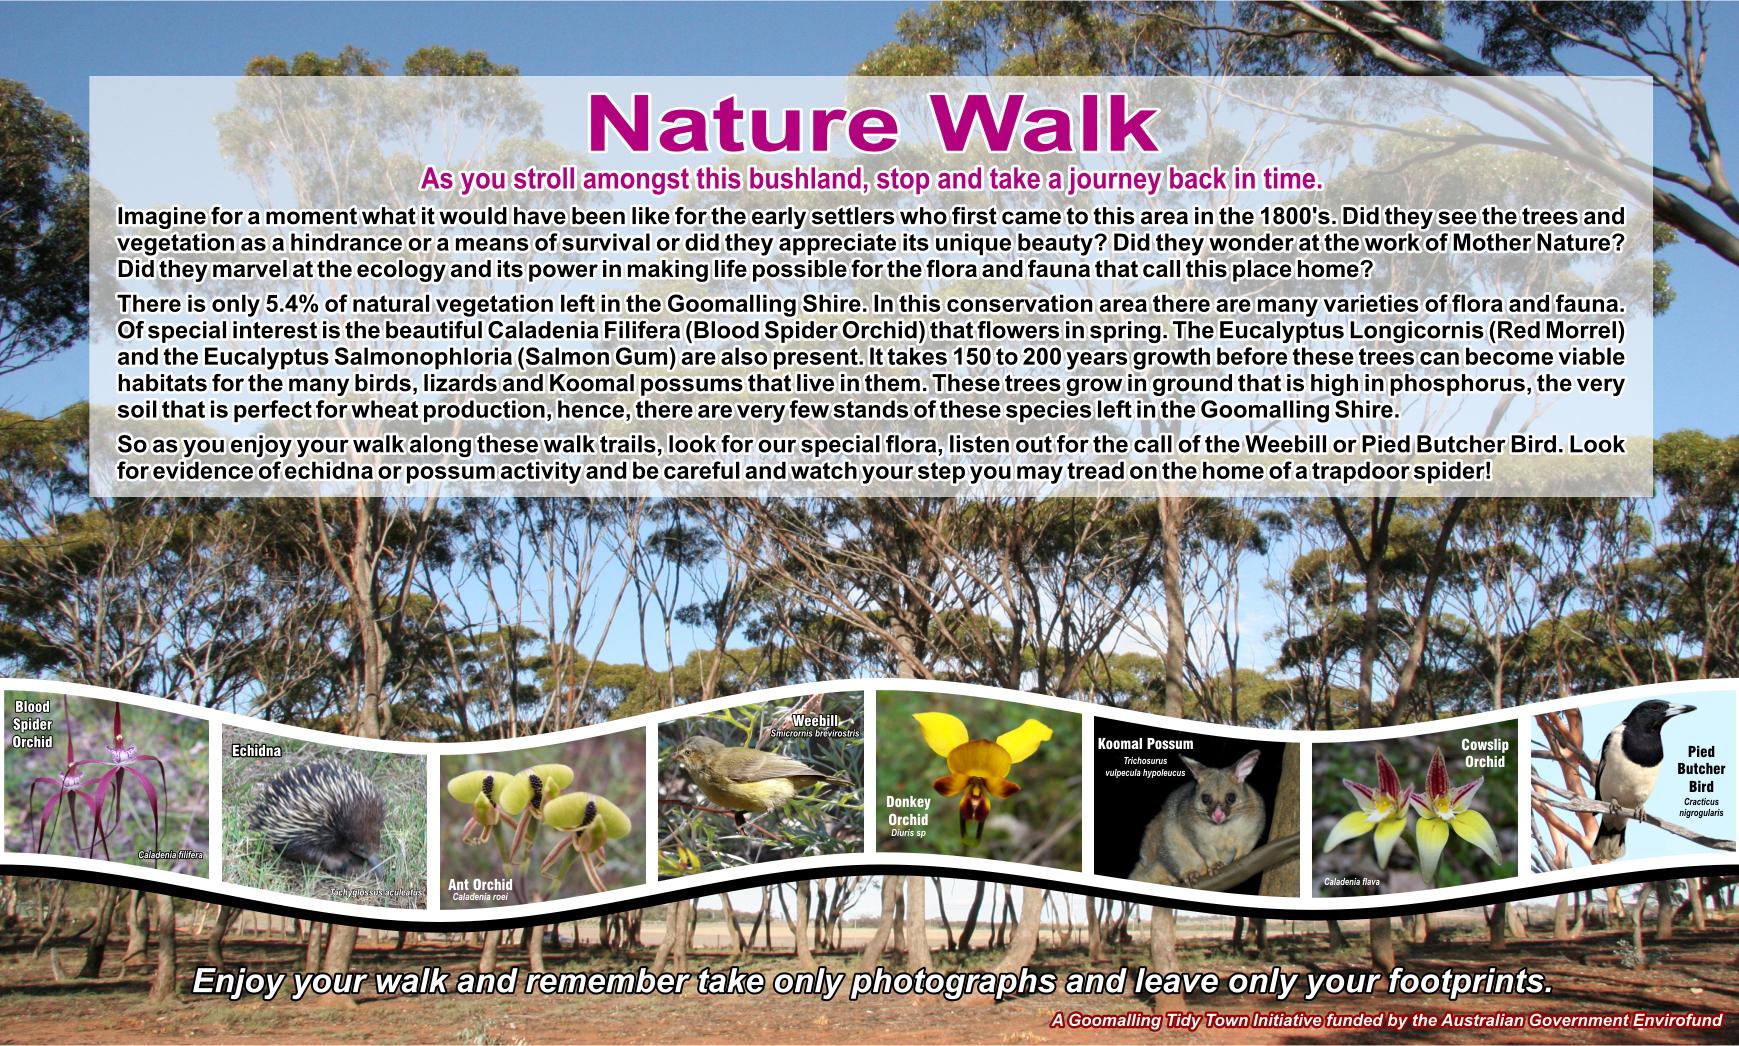 Nature Walk information sign at Salmon Gum Way, Goomalling WA